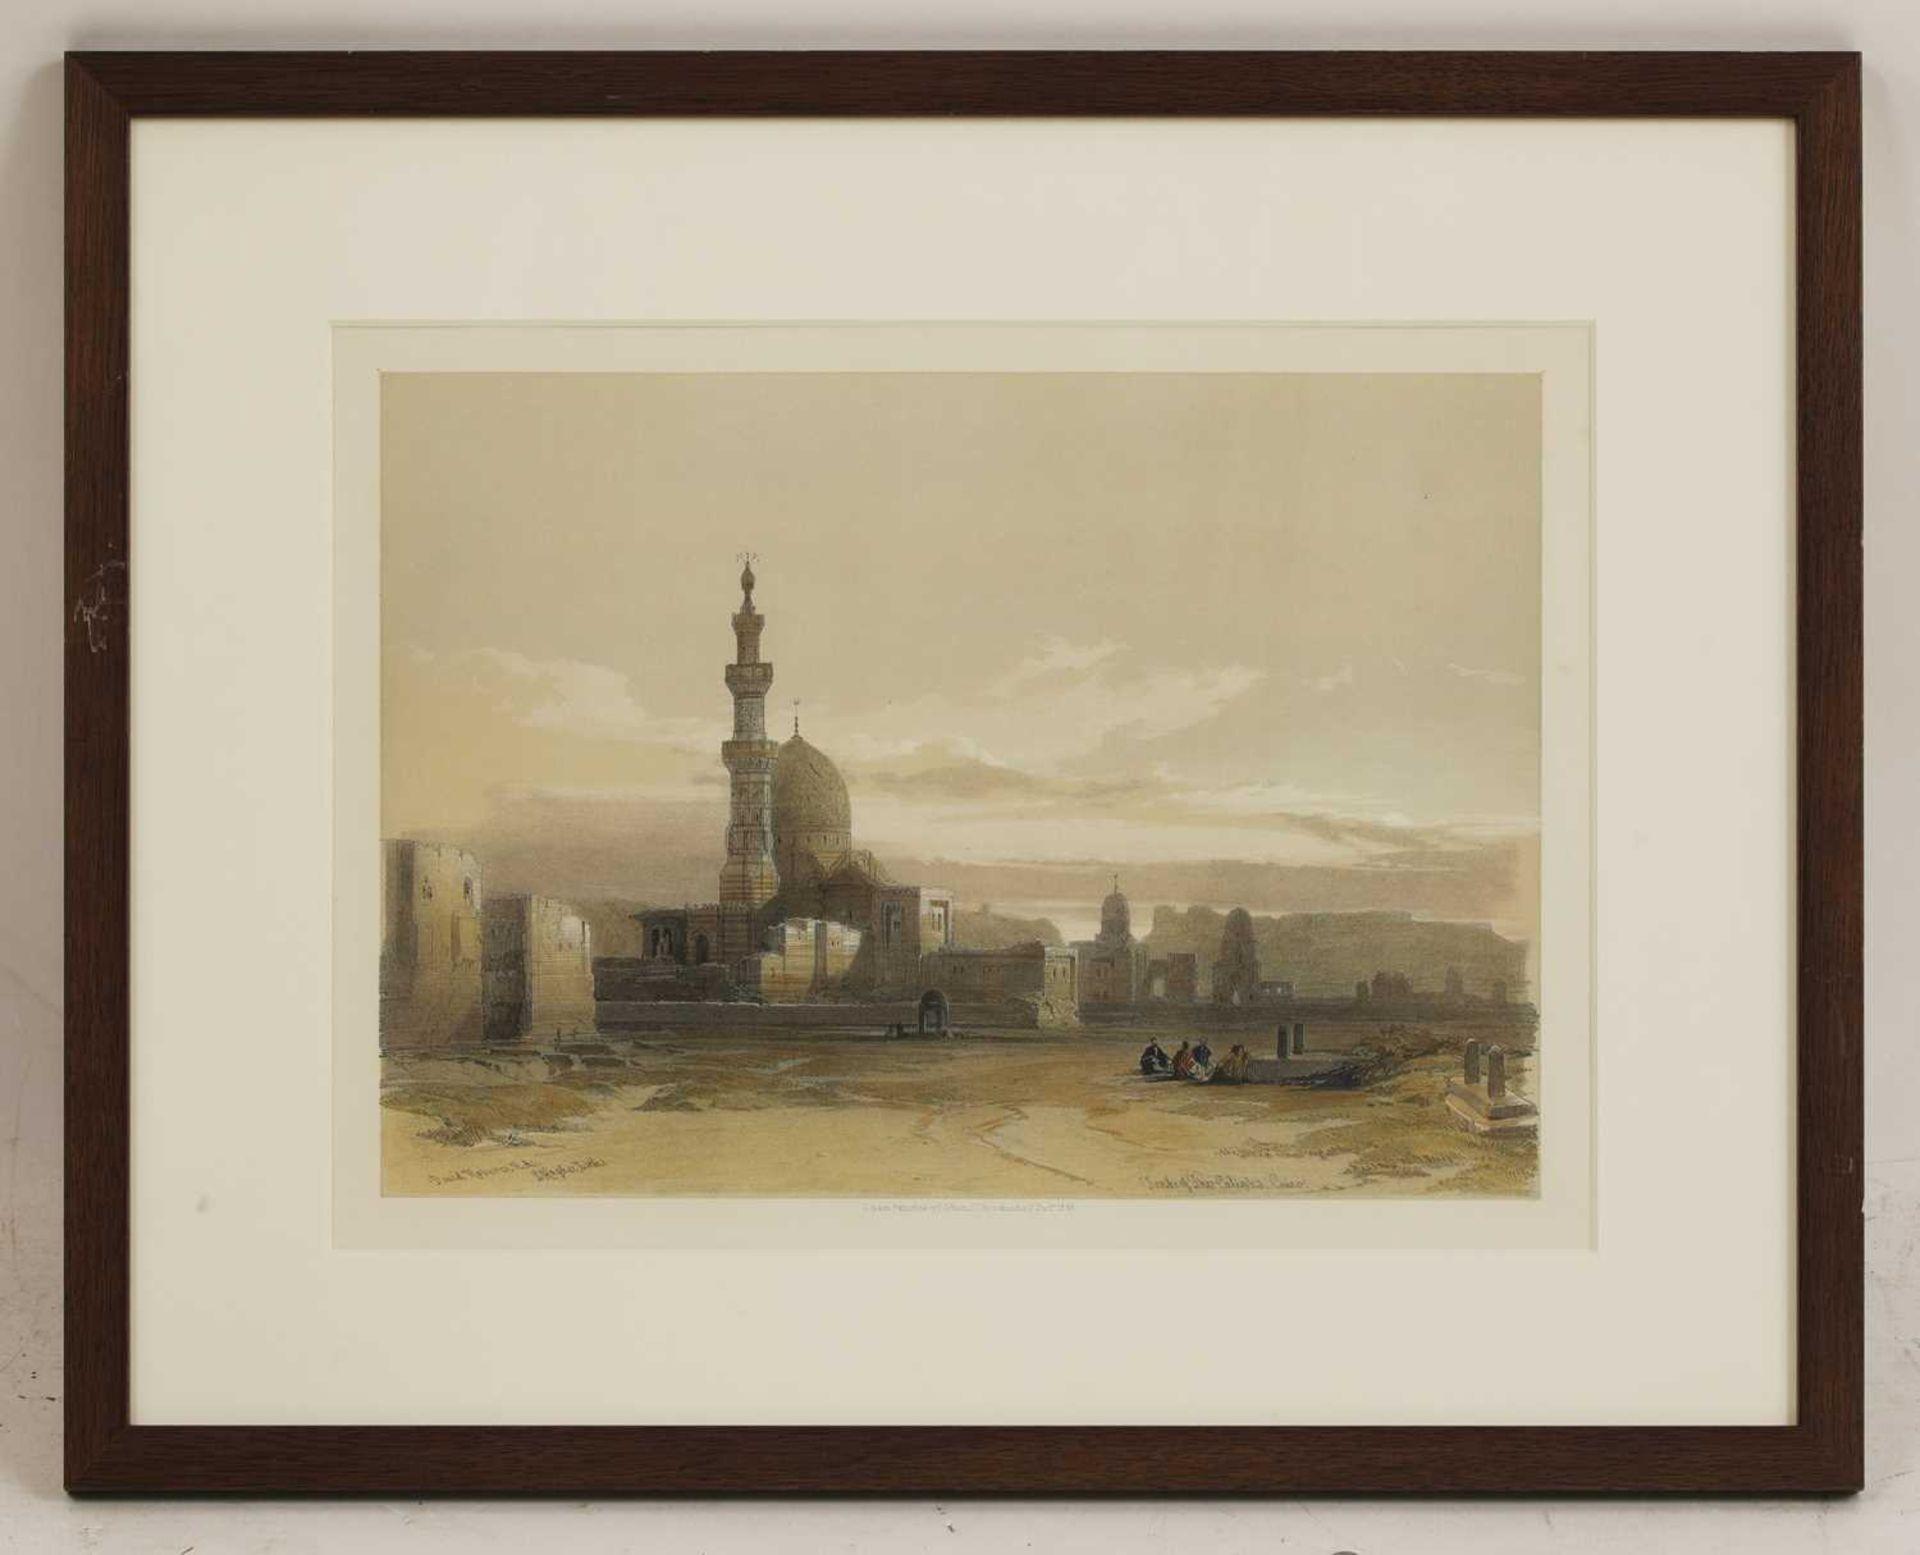 Louis Haghe after David Roberts RA (1796-1864) - Image 2 of 20